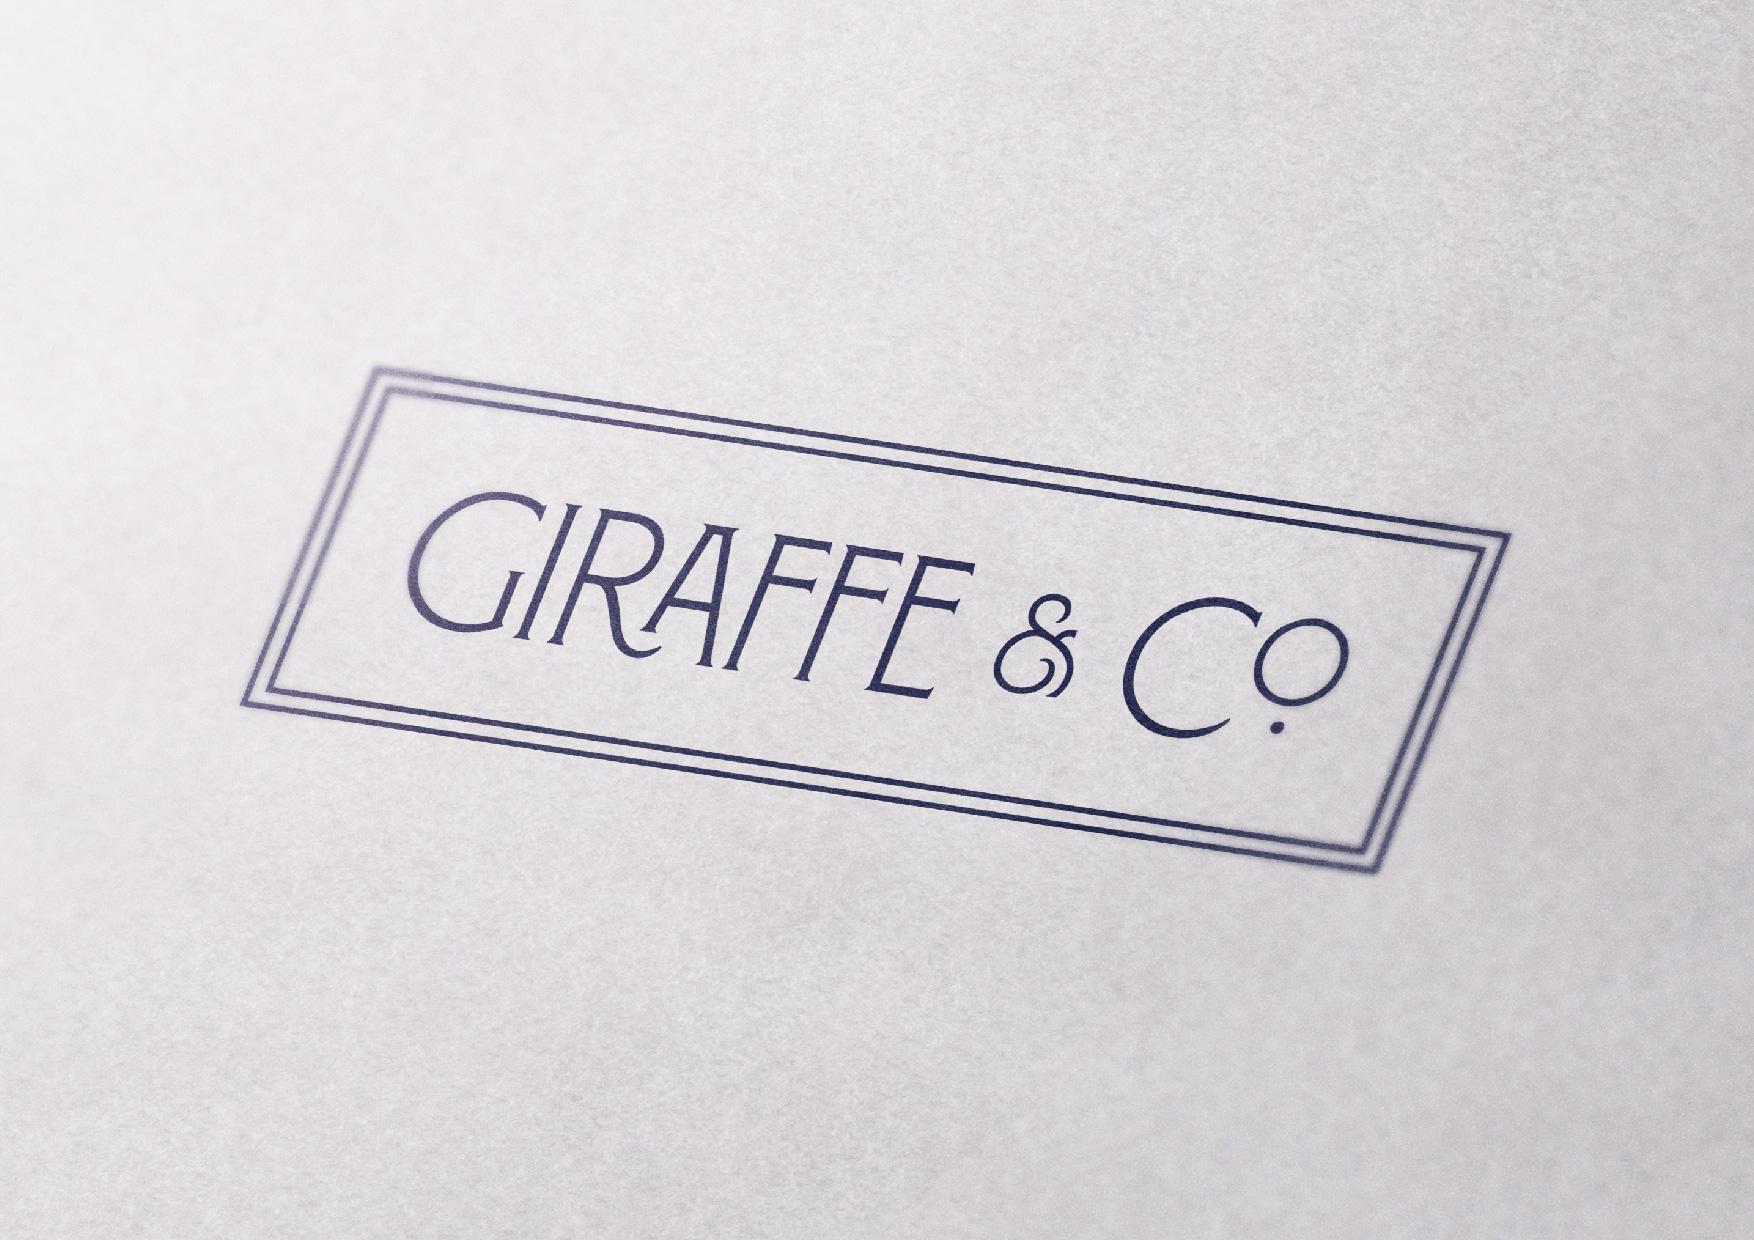 giraffeco-branding-final-06